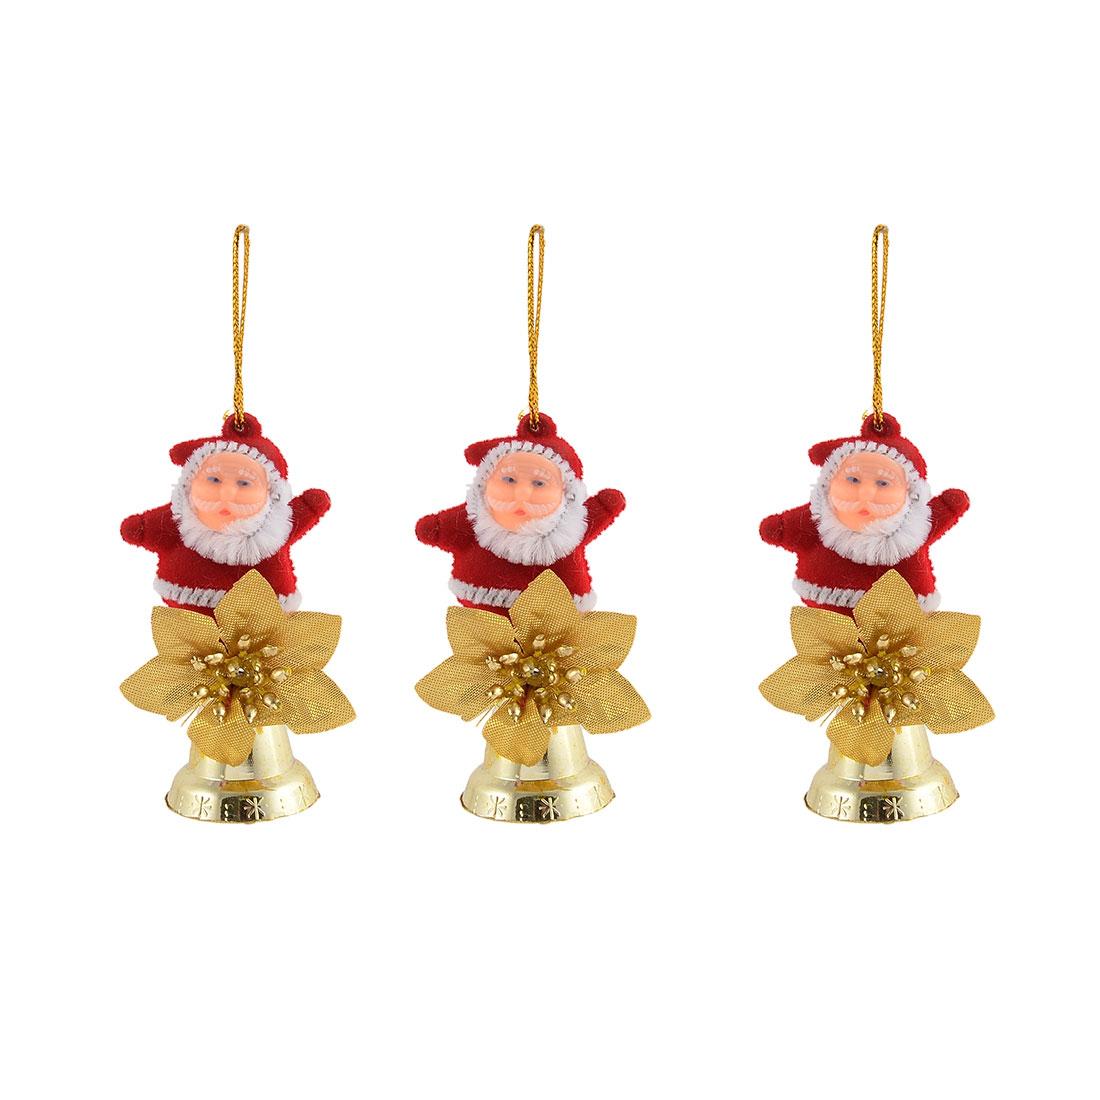 Christmas Party Plastic Santa Claus Shaped Pendant Tree Decoration Adornment 3pcs